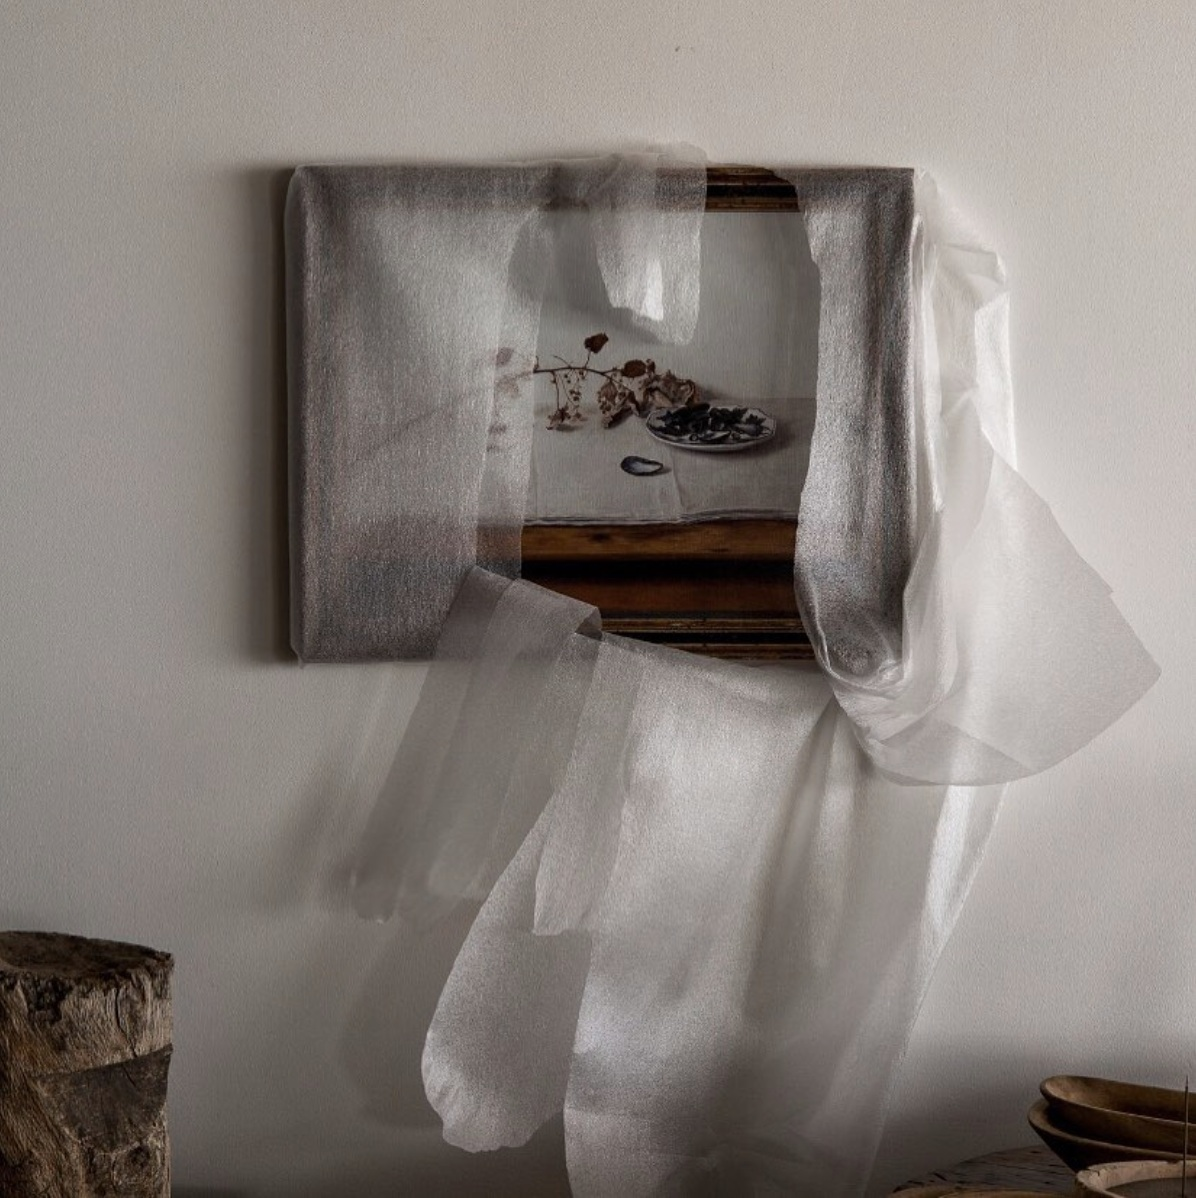 Democratizing Art ⏤ In Conversation with Portia de Rossi & Slater Herman of General Public on Anniversary Magazine